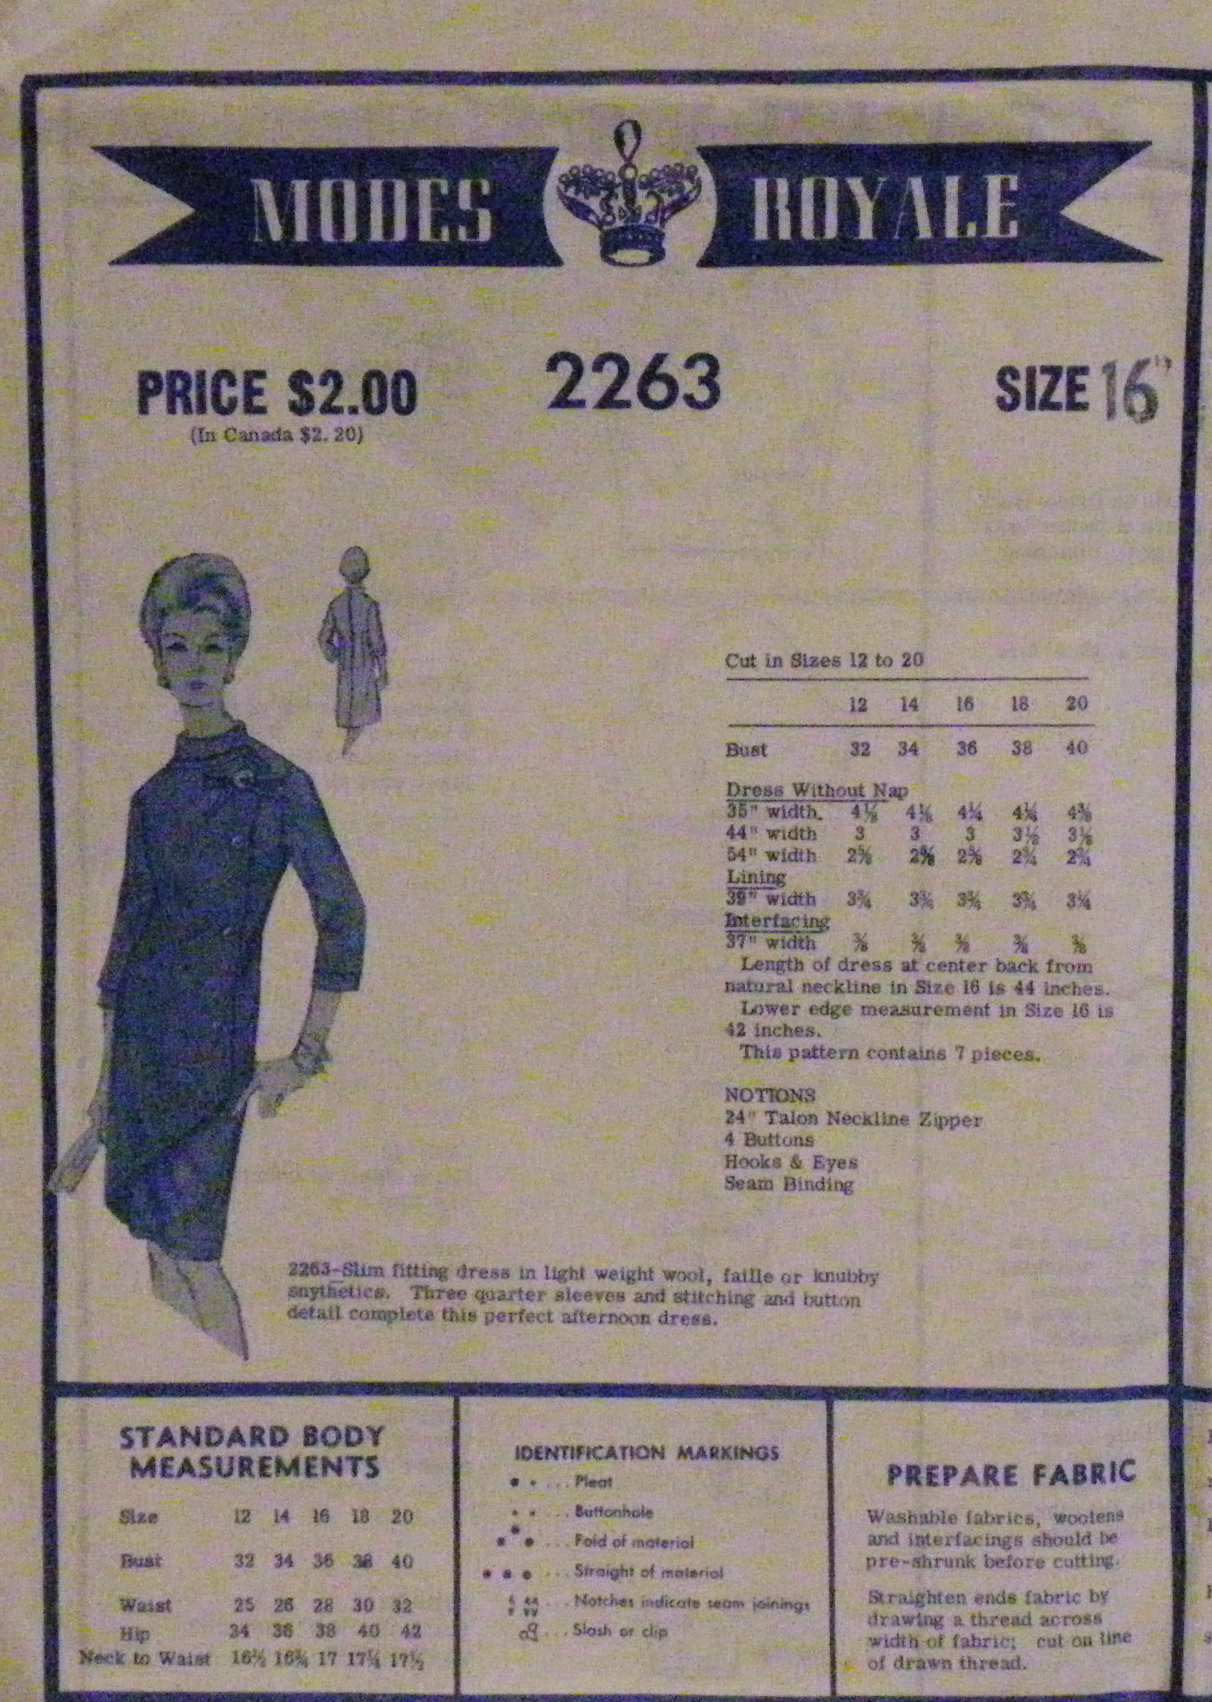 Modes Royale 2263